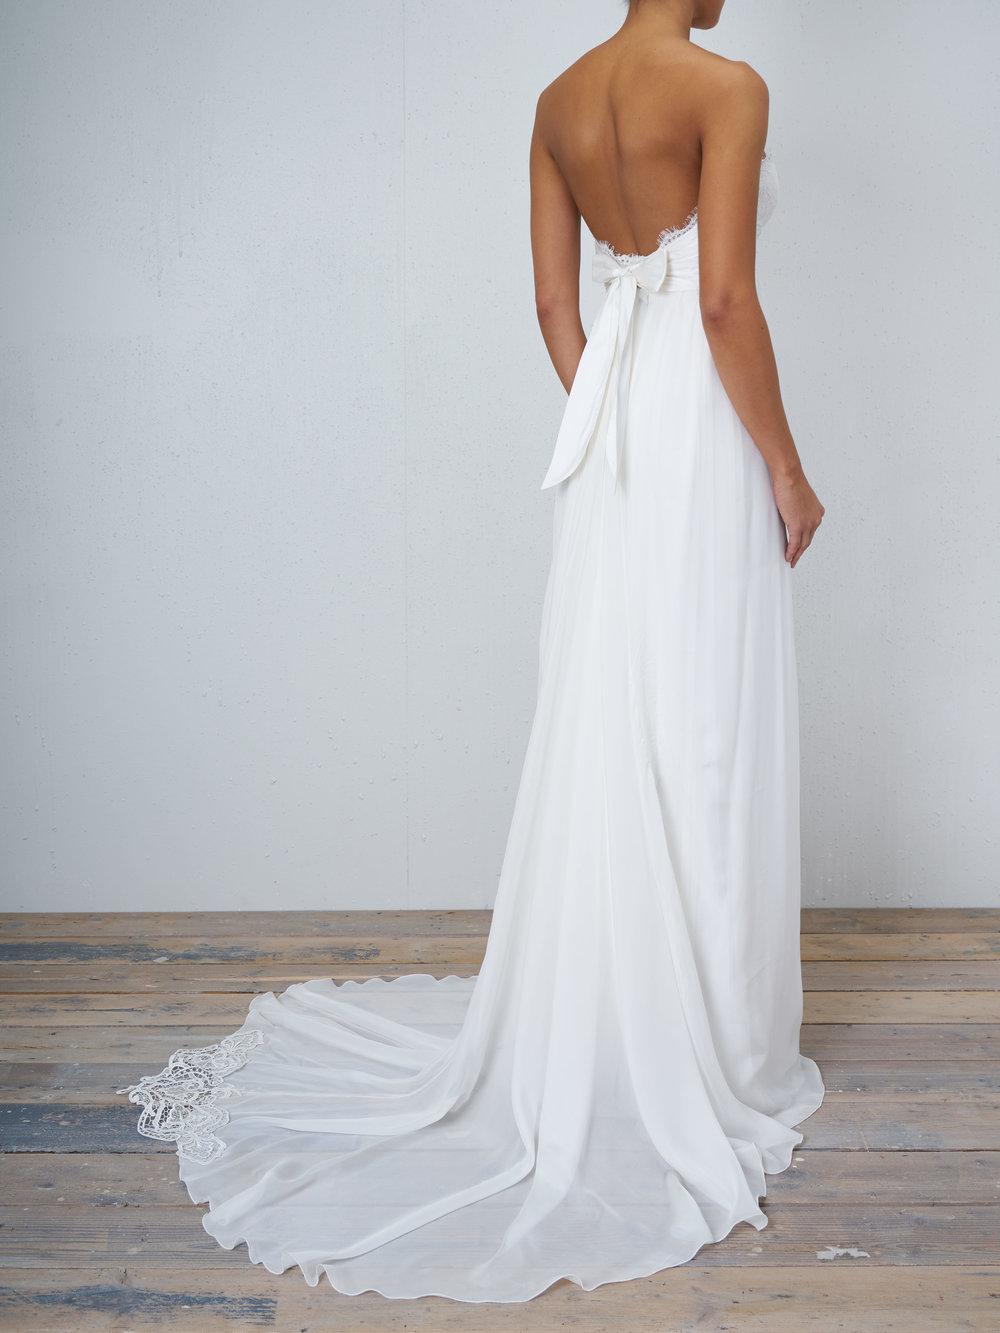 Brooklyn Dress4070.jpg